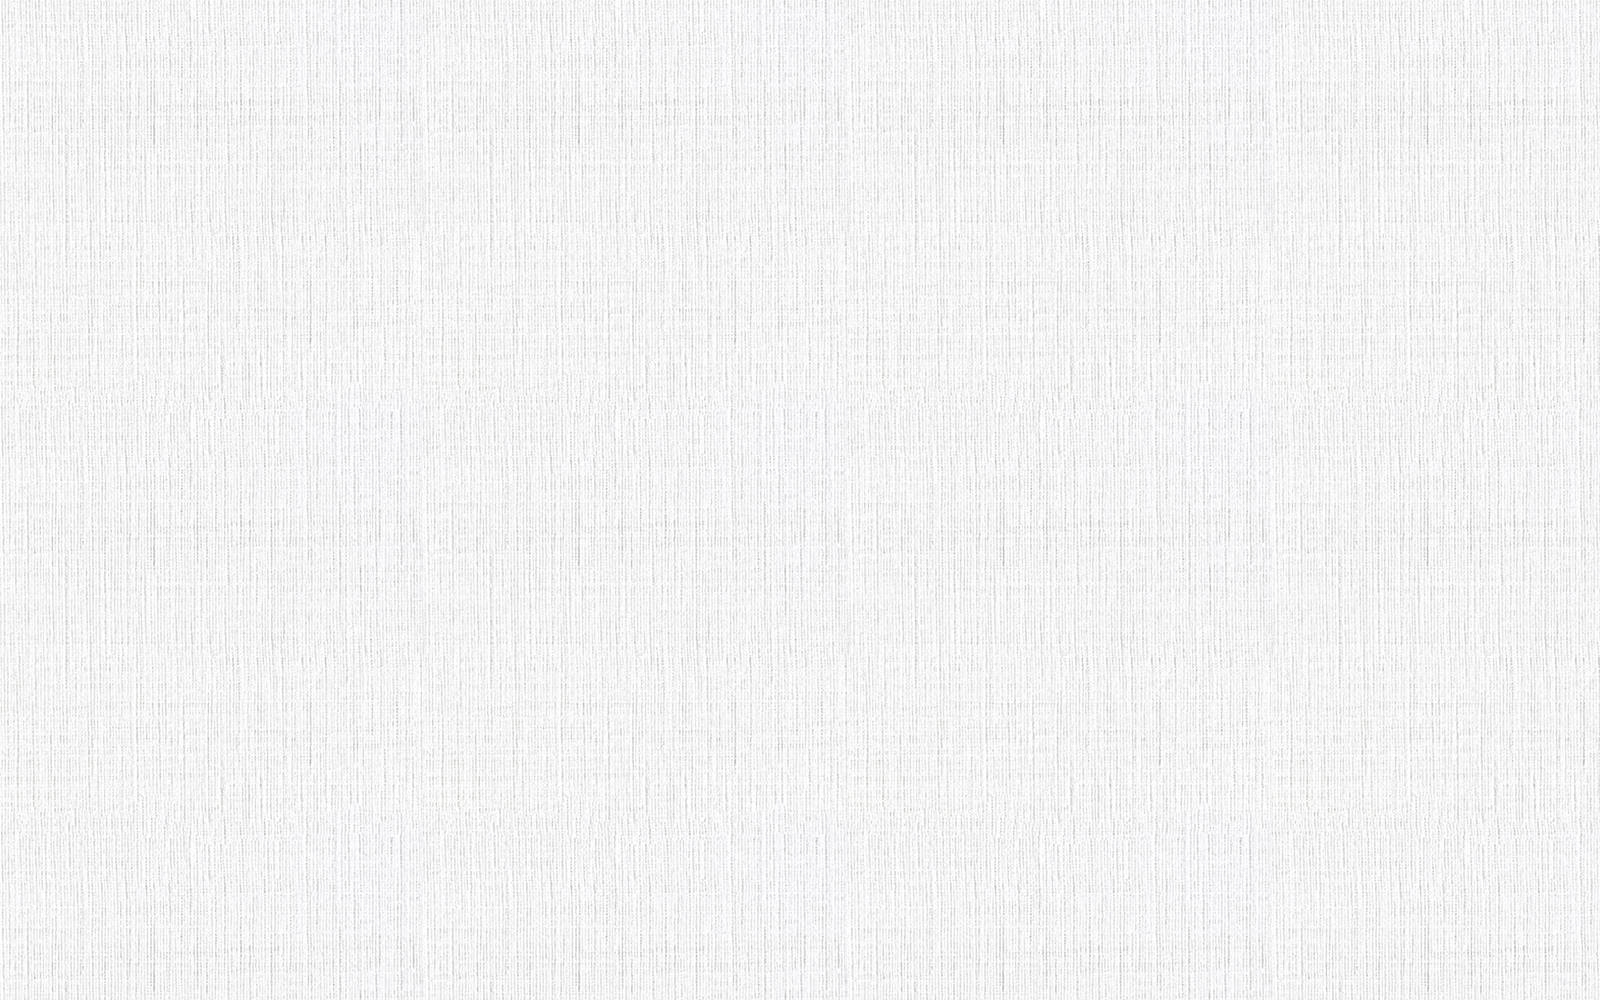 white-linen-background